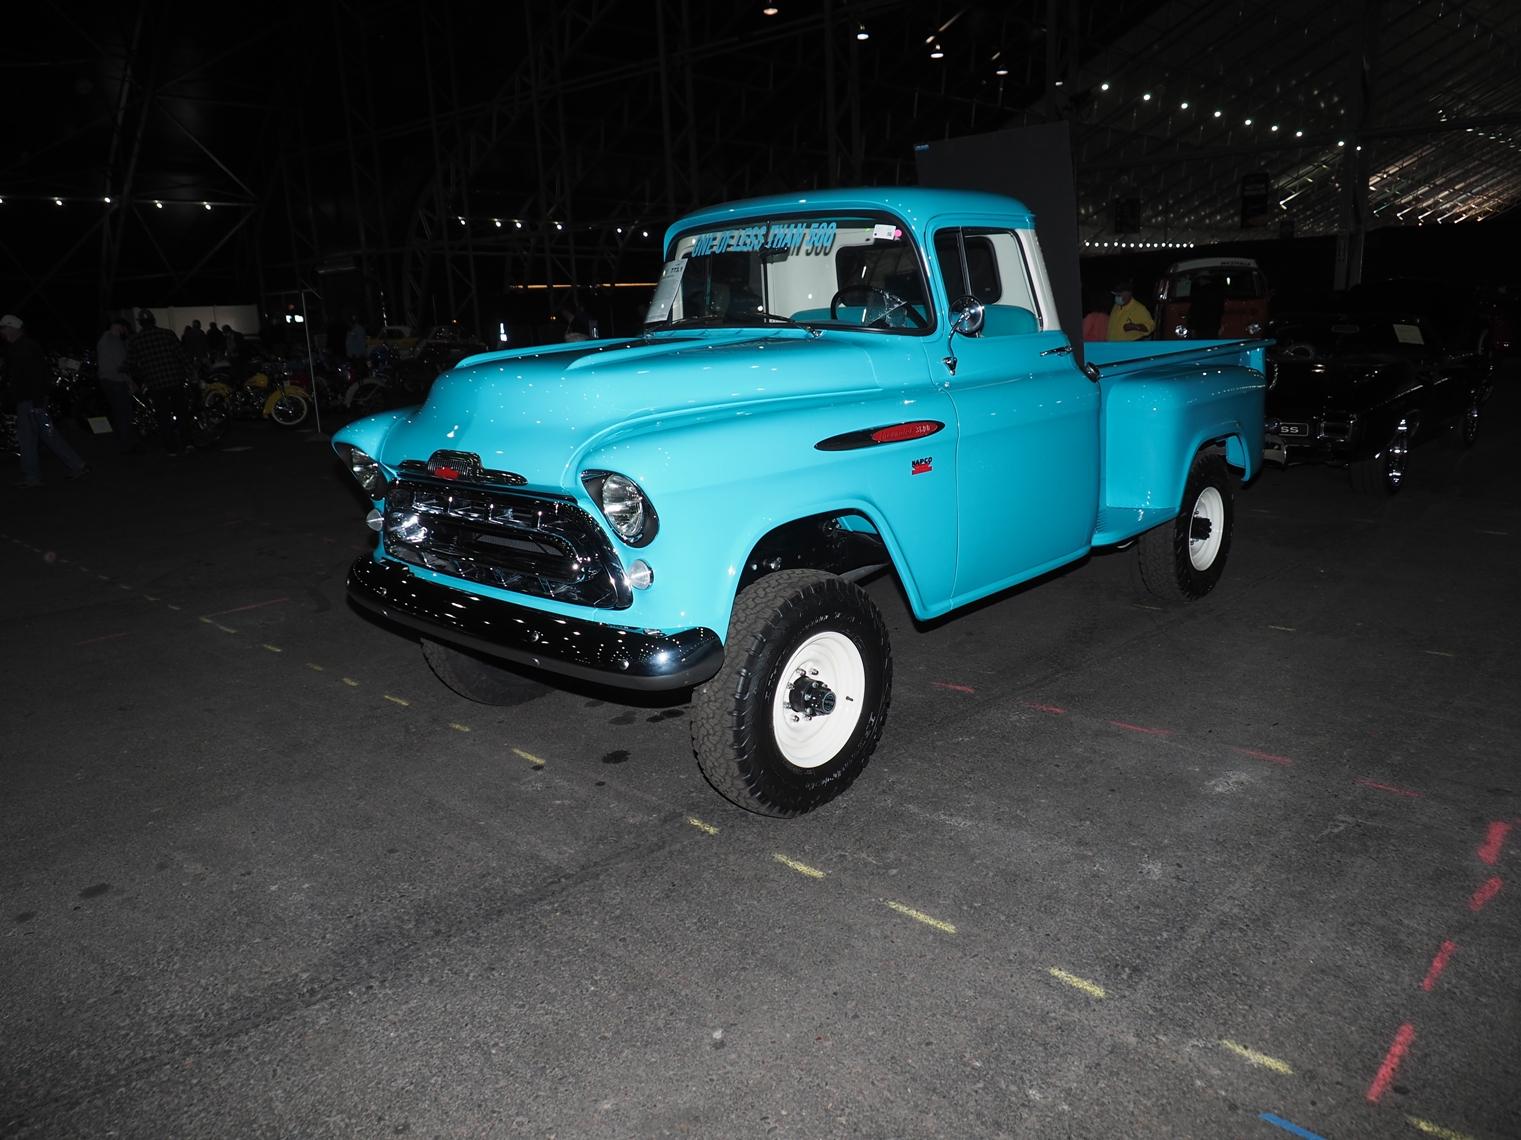 NAPCO 4x4 kit on Chevy Truck